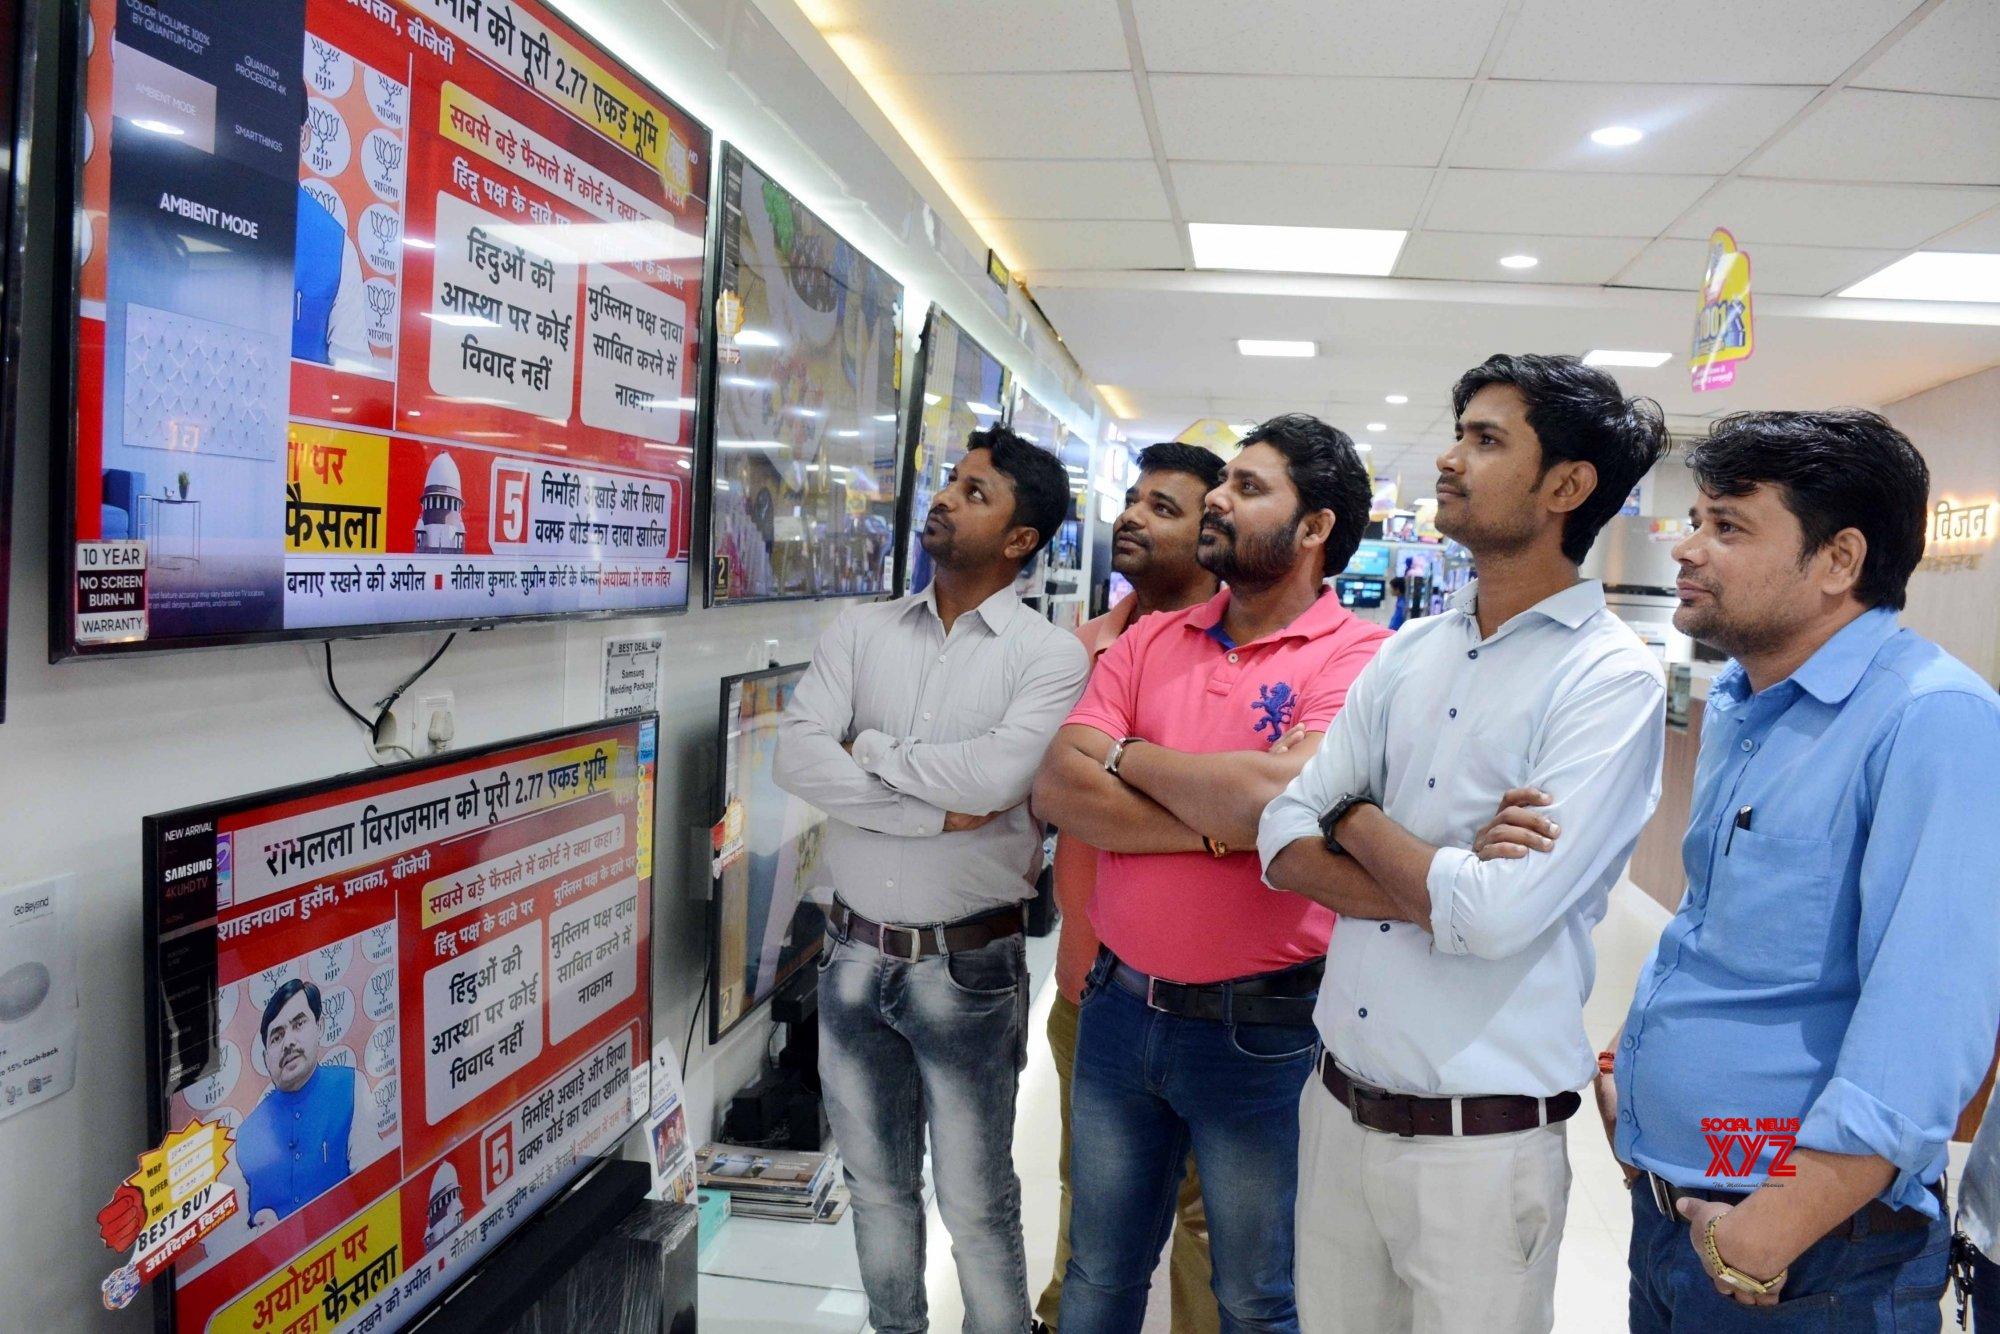 Patna: People watch SC's Ayodhya verdict telecast #Gallery